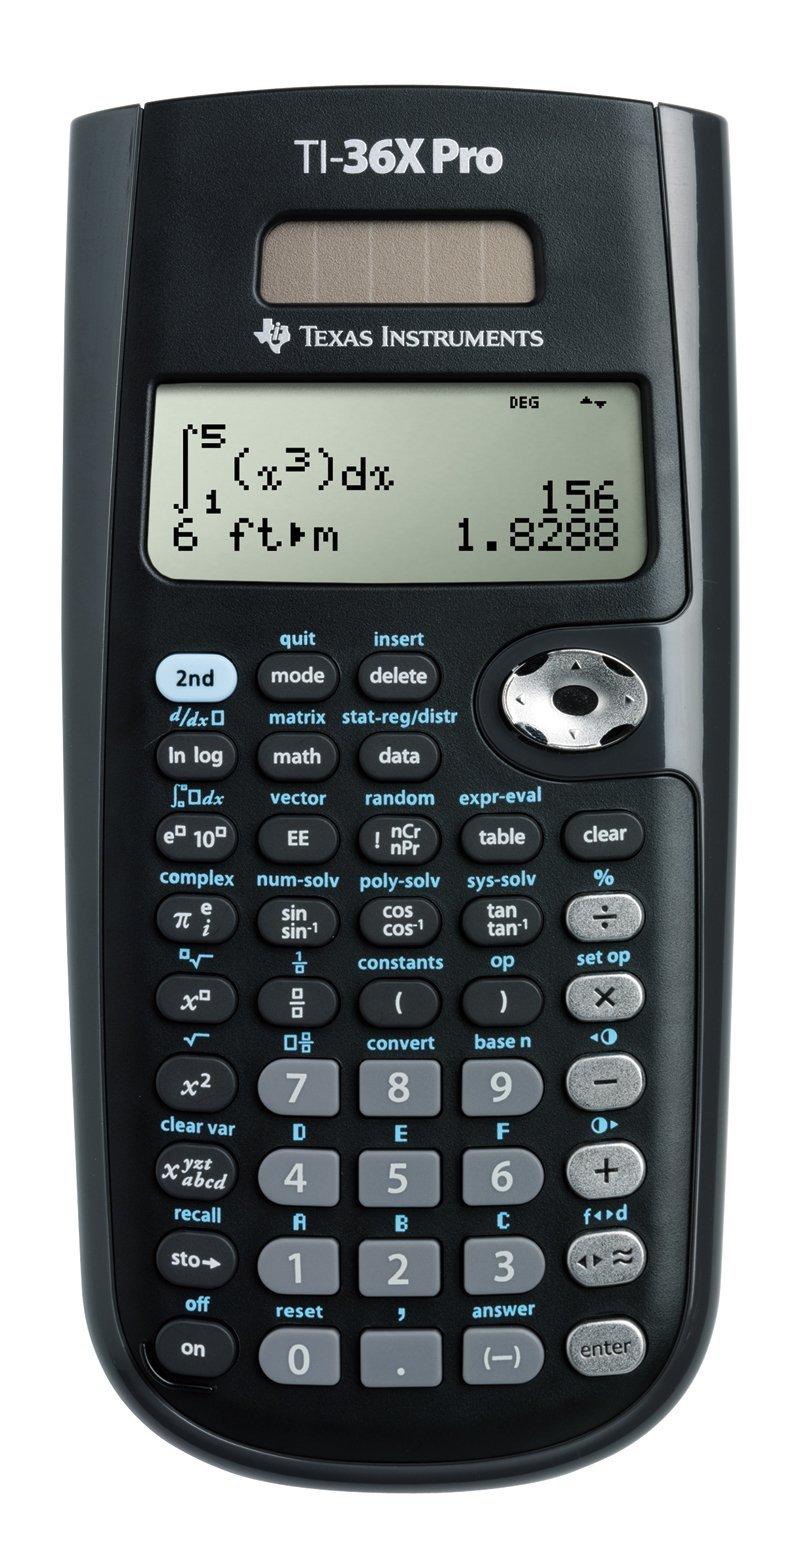 Texas Instruments TI-36X Pro Engineering/Scientific Calculator (Renewed) by Texas Instruments